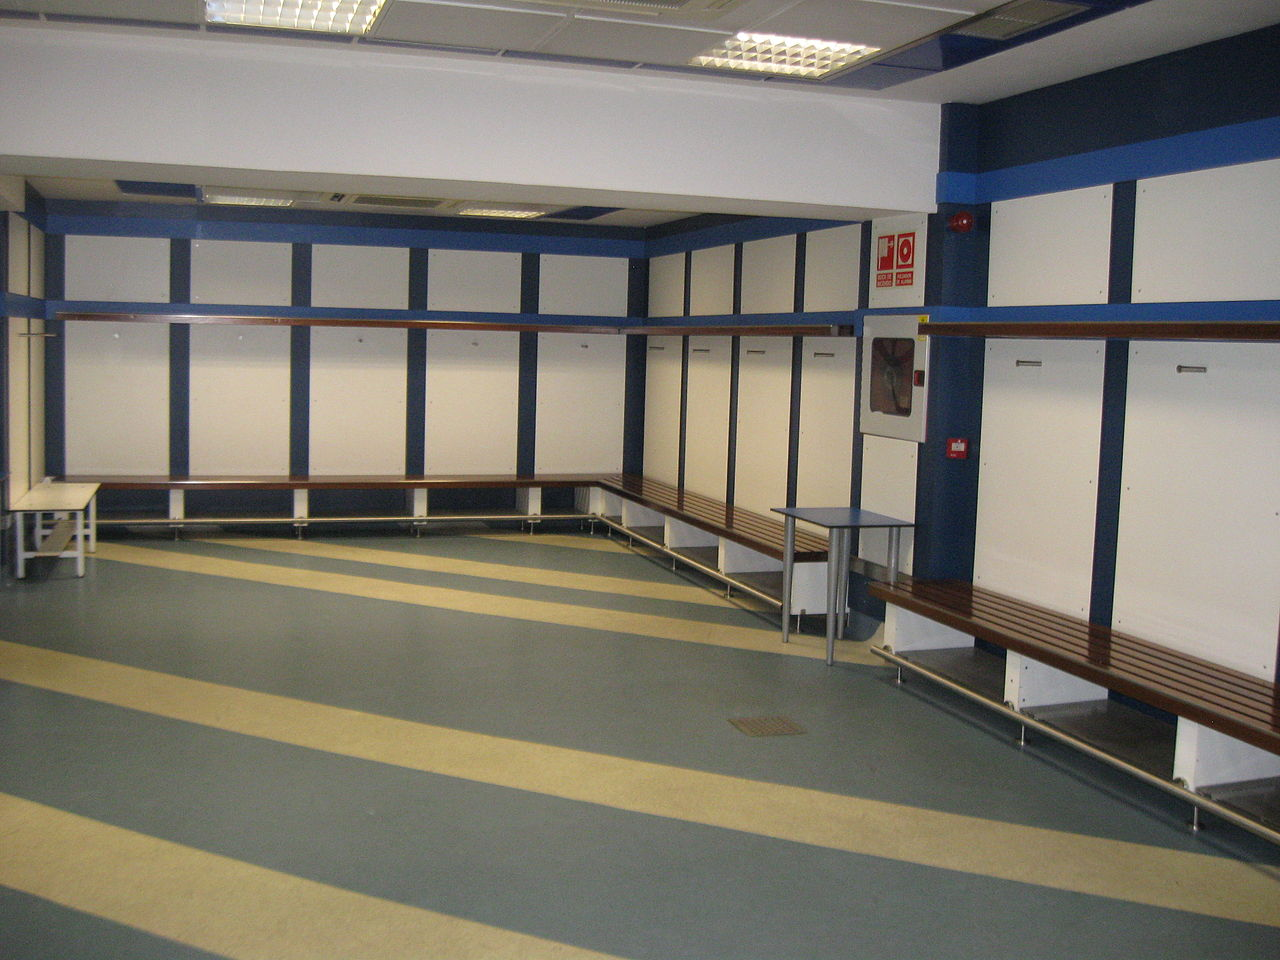 Стадион Сантьяго Бернабеу, раздевалка